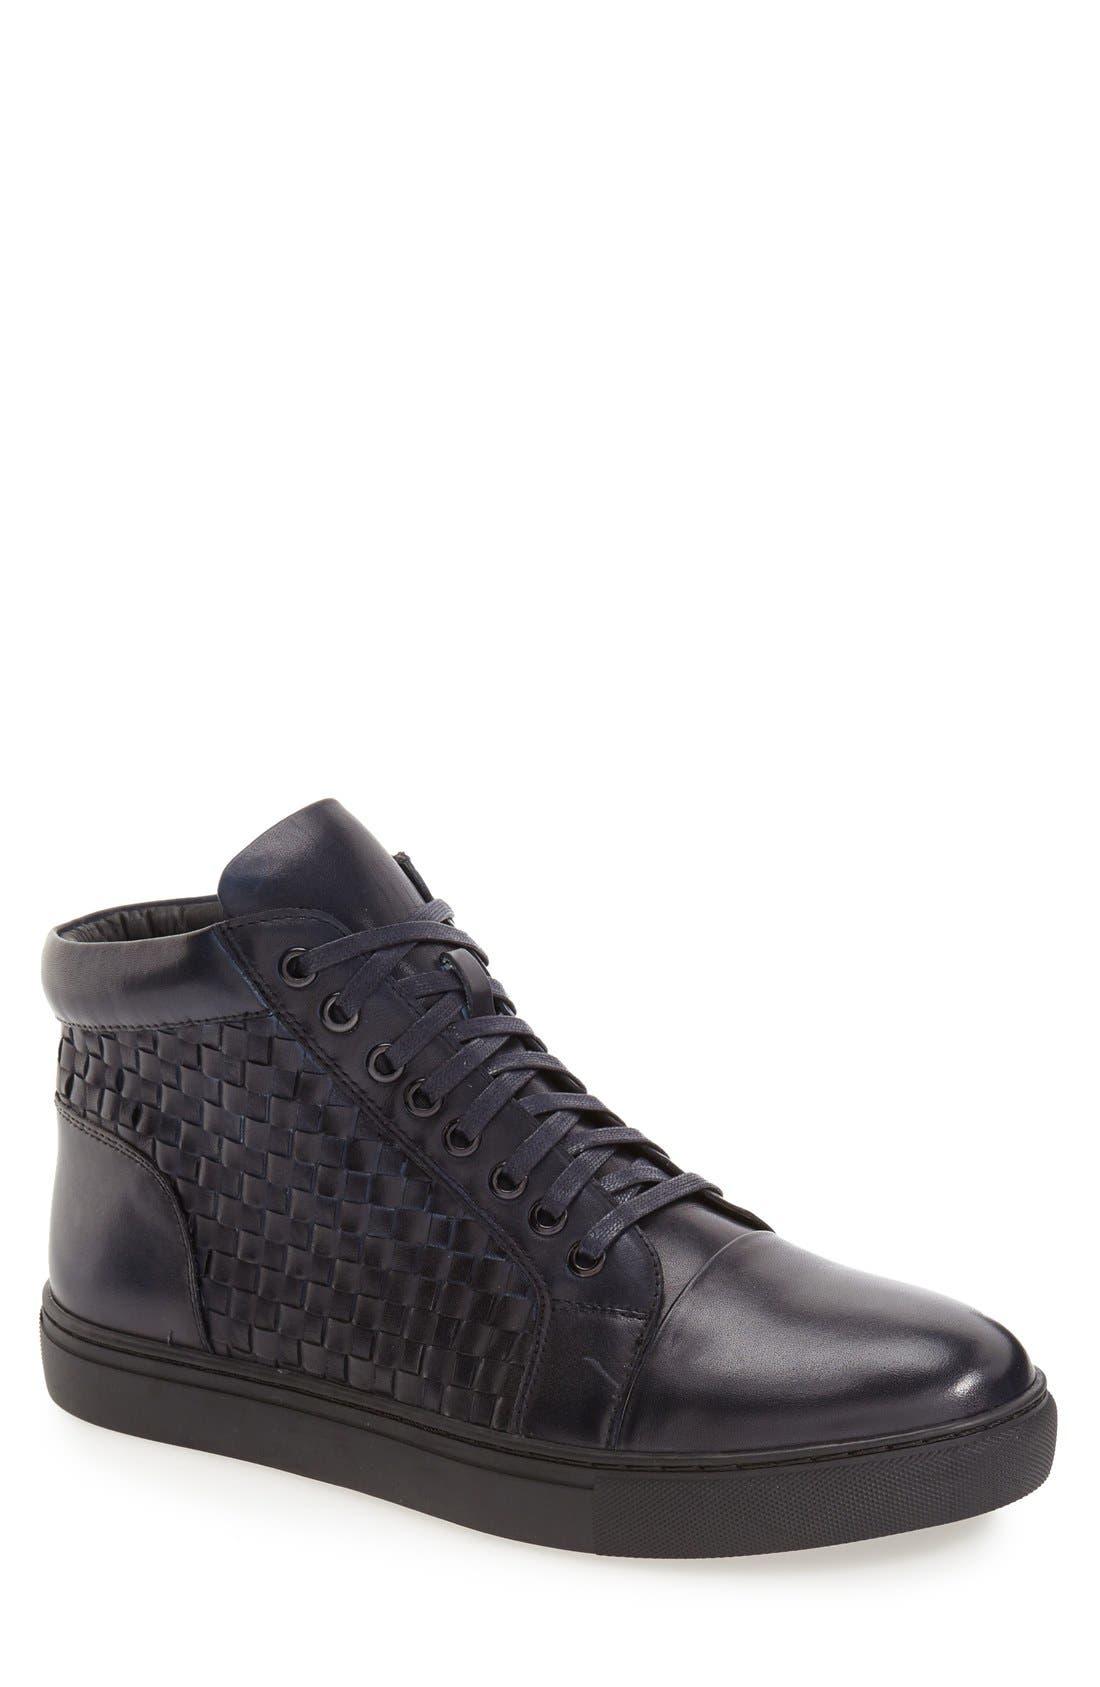 Soul High Top Sneaker,                         Main,                         color, Navy